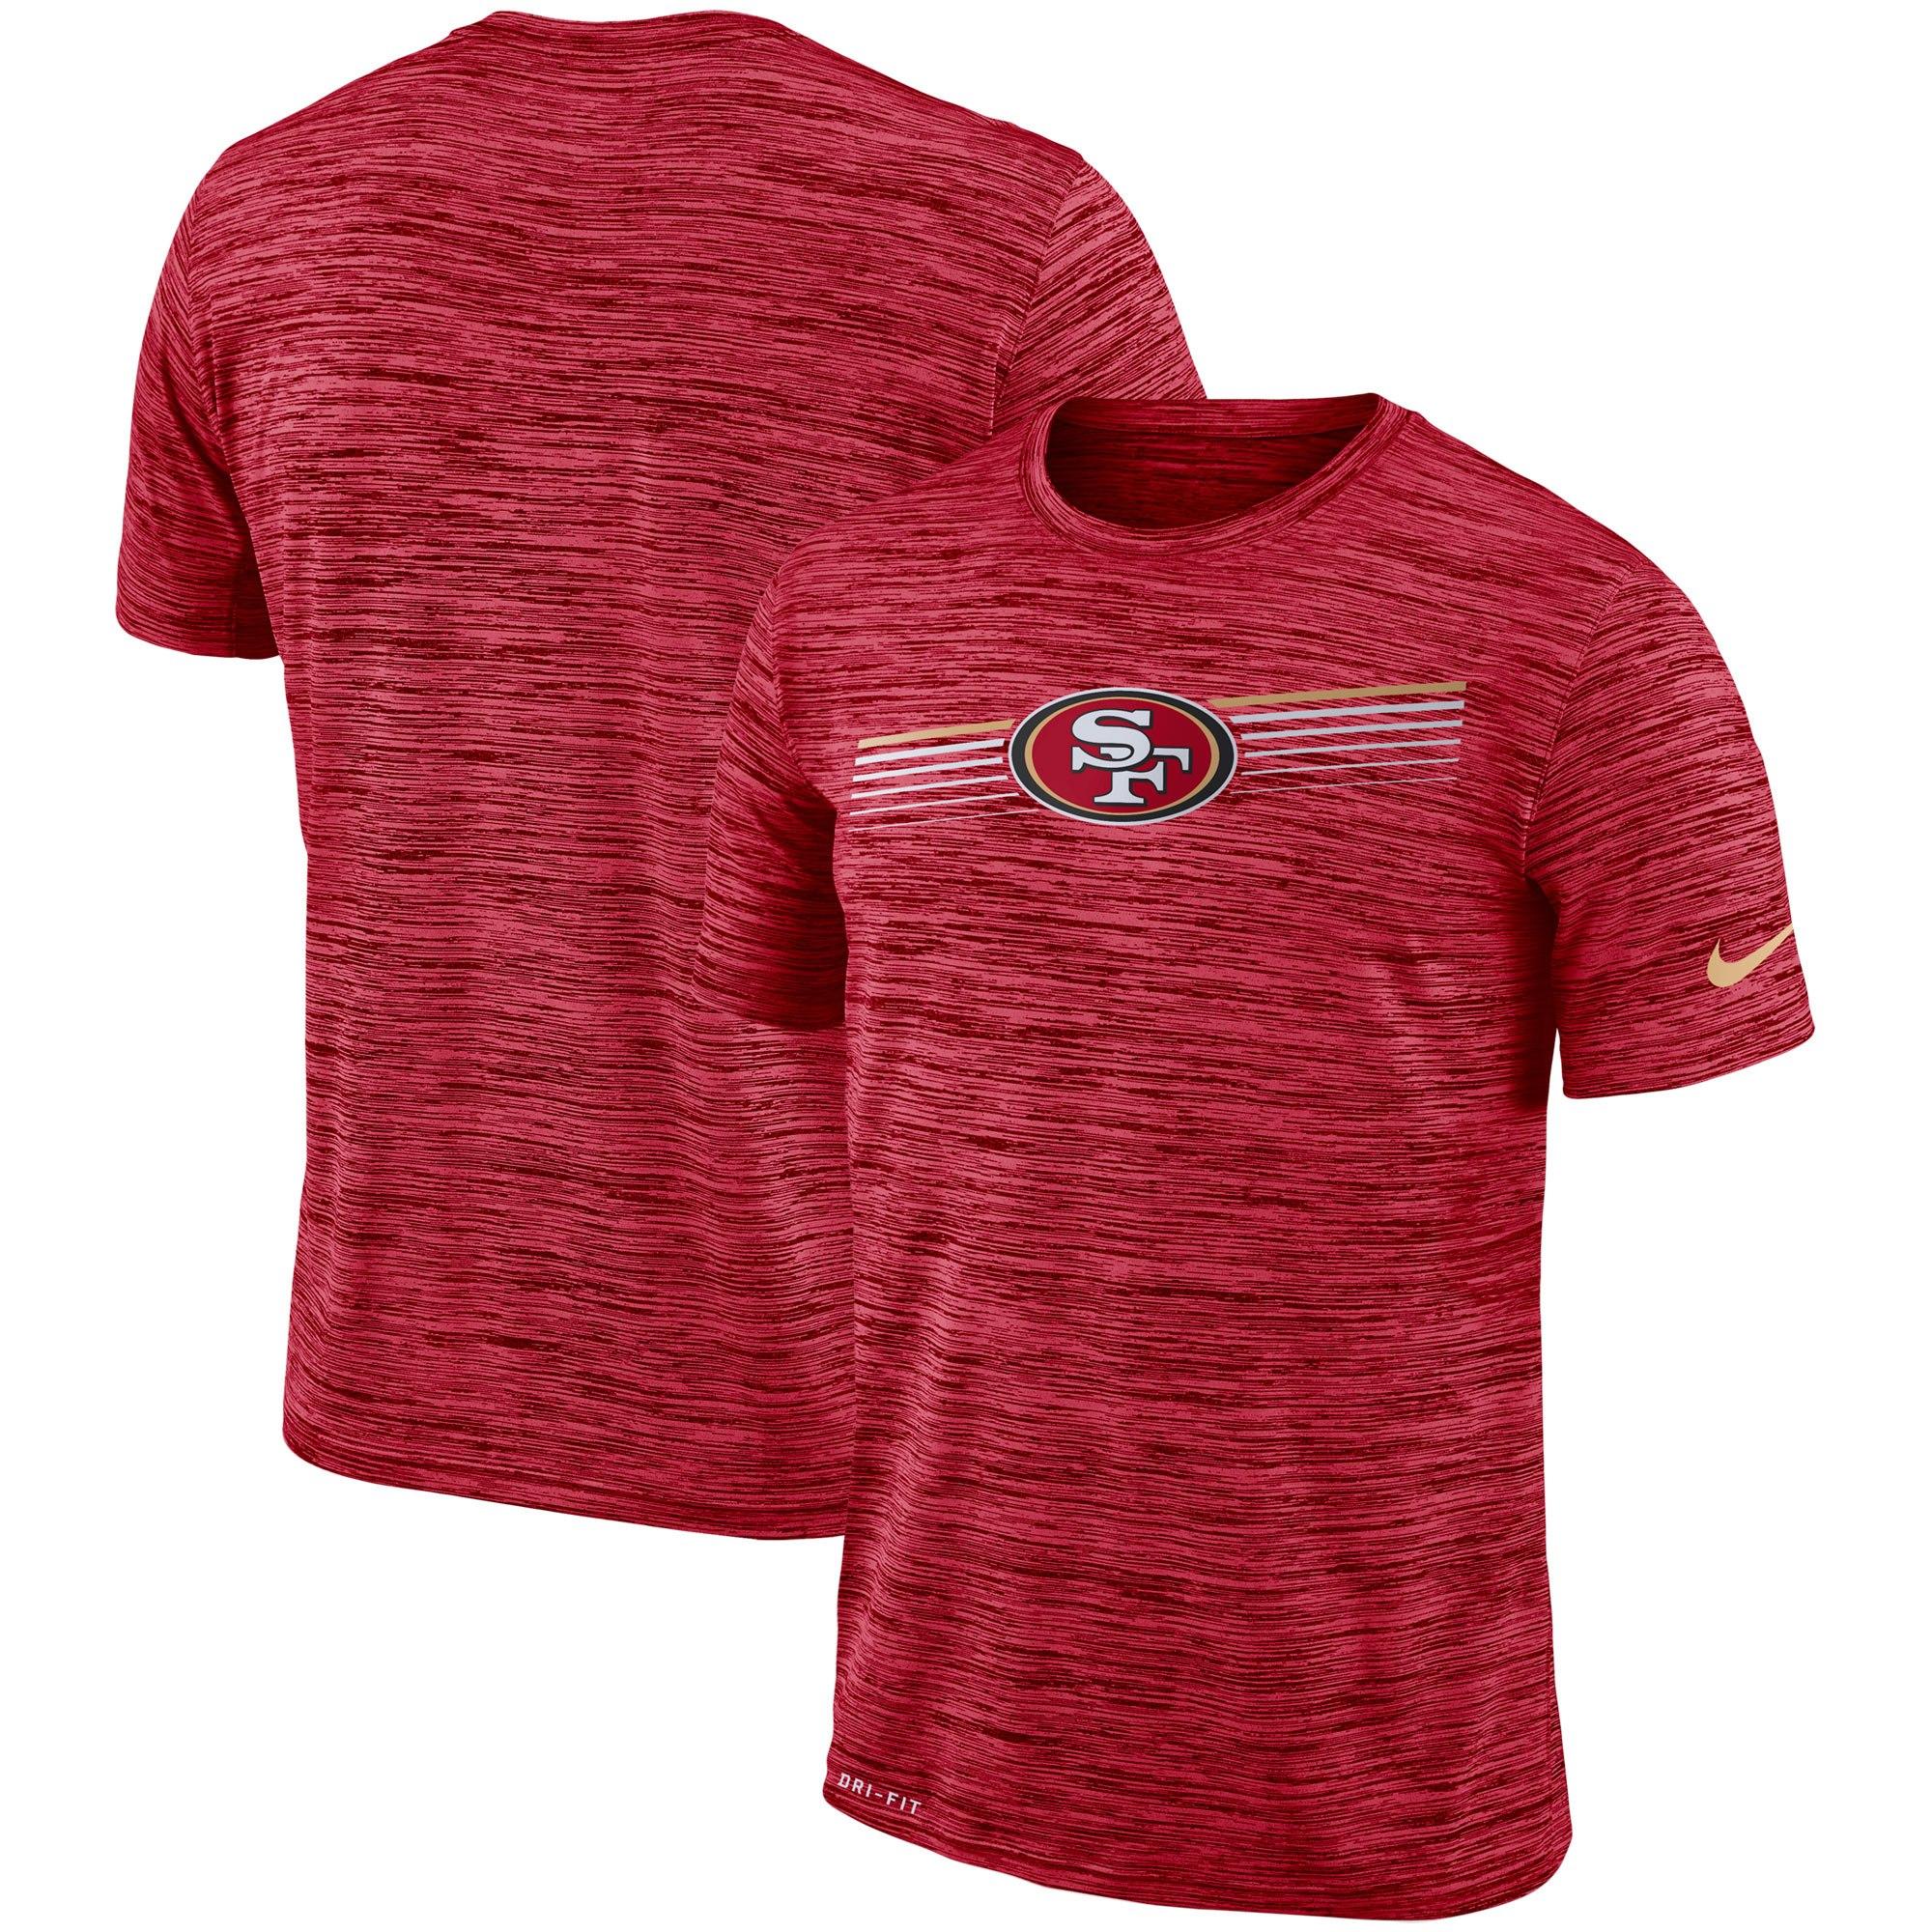 San Francisco 49ers Nike Sideline Velocity Performance T-Shirt Heathered Scarlet